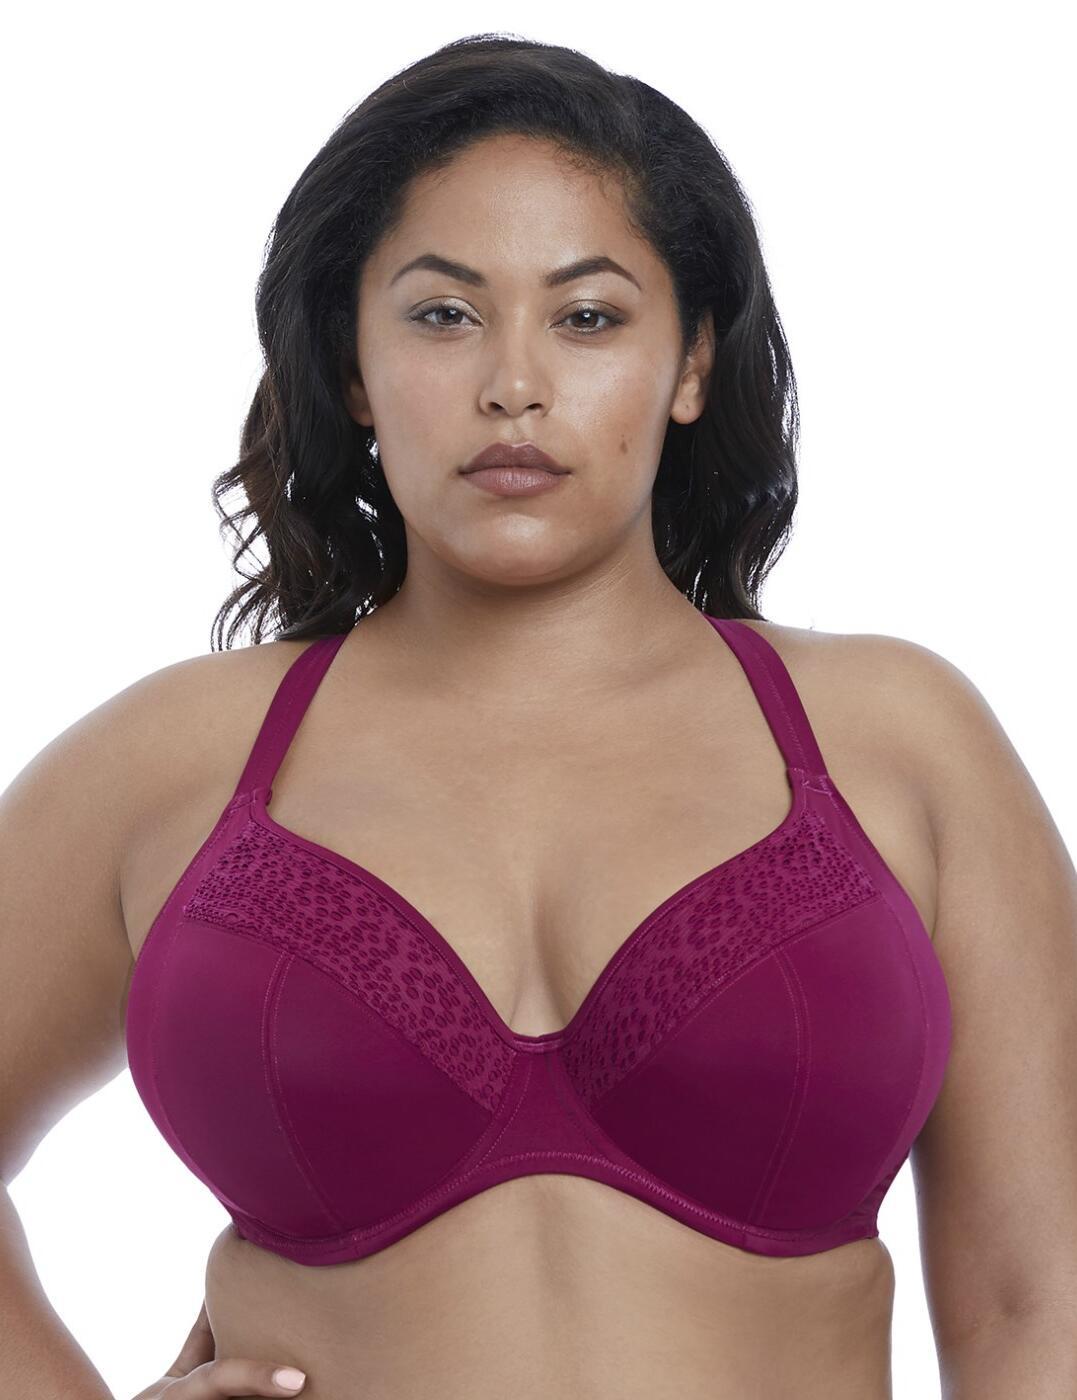 7536 Elomi Indie Underwired Plunge Multiway Bikini Top - 7536 Berry